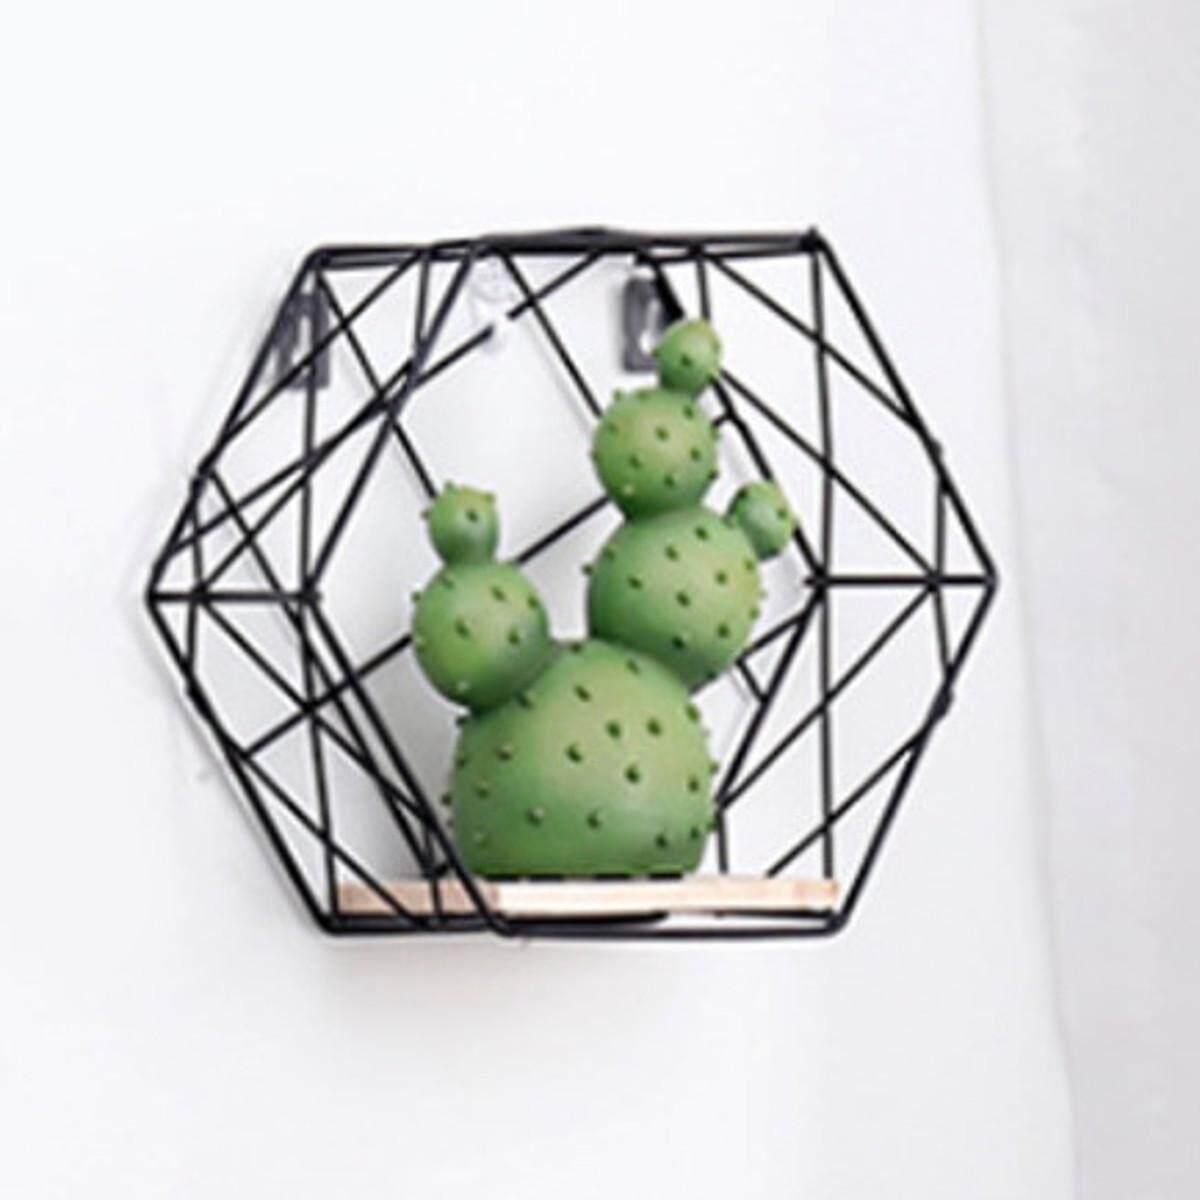 Hexagon Metal Wall Hanging Shelf Rack Storage Rack Holder Organizer Trellis Design